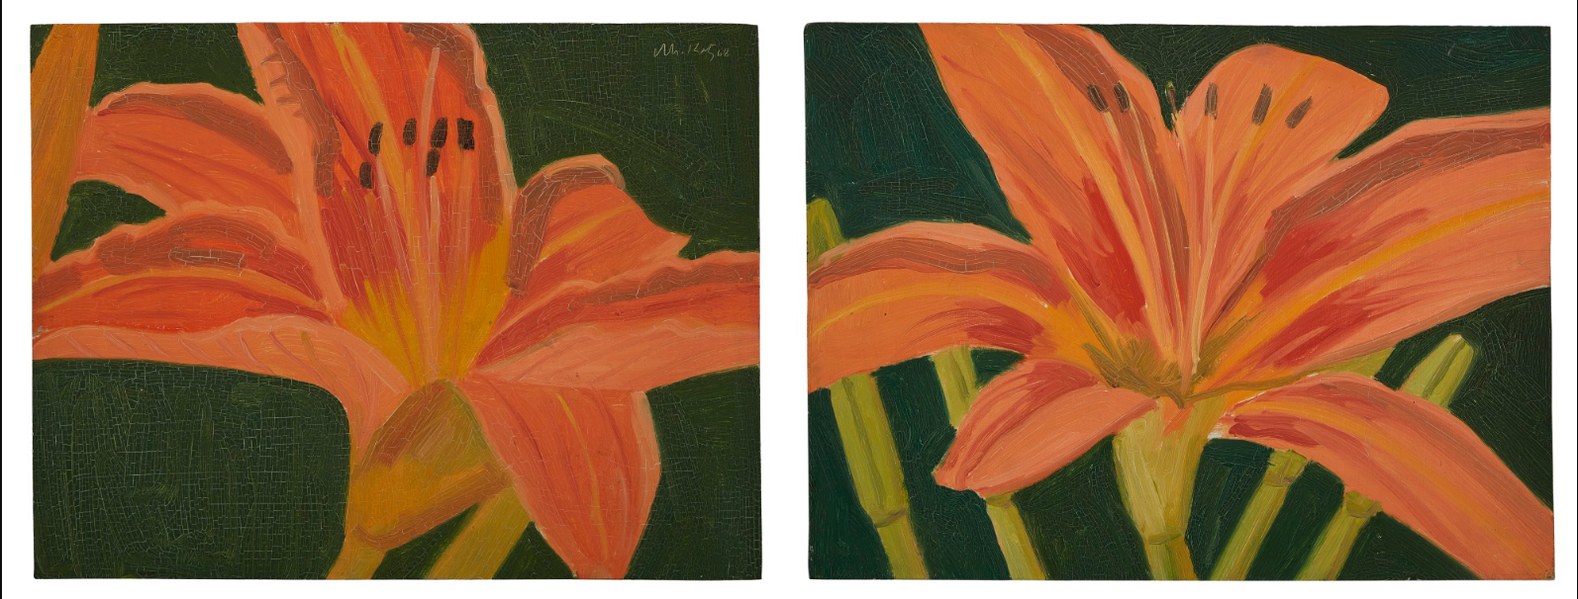 Alex Katz-Untitled (Lilies) [Two Works]-1968